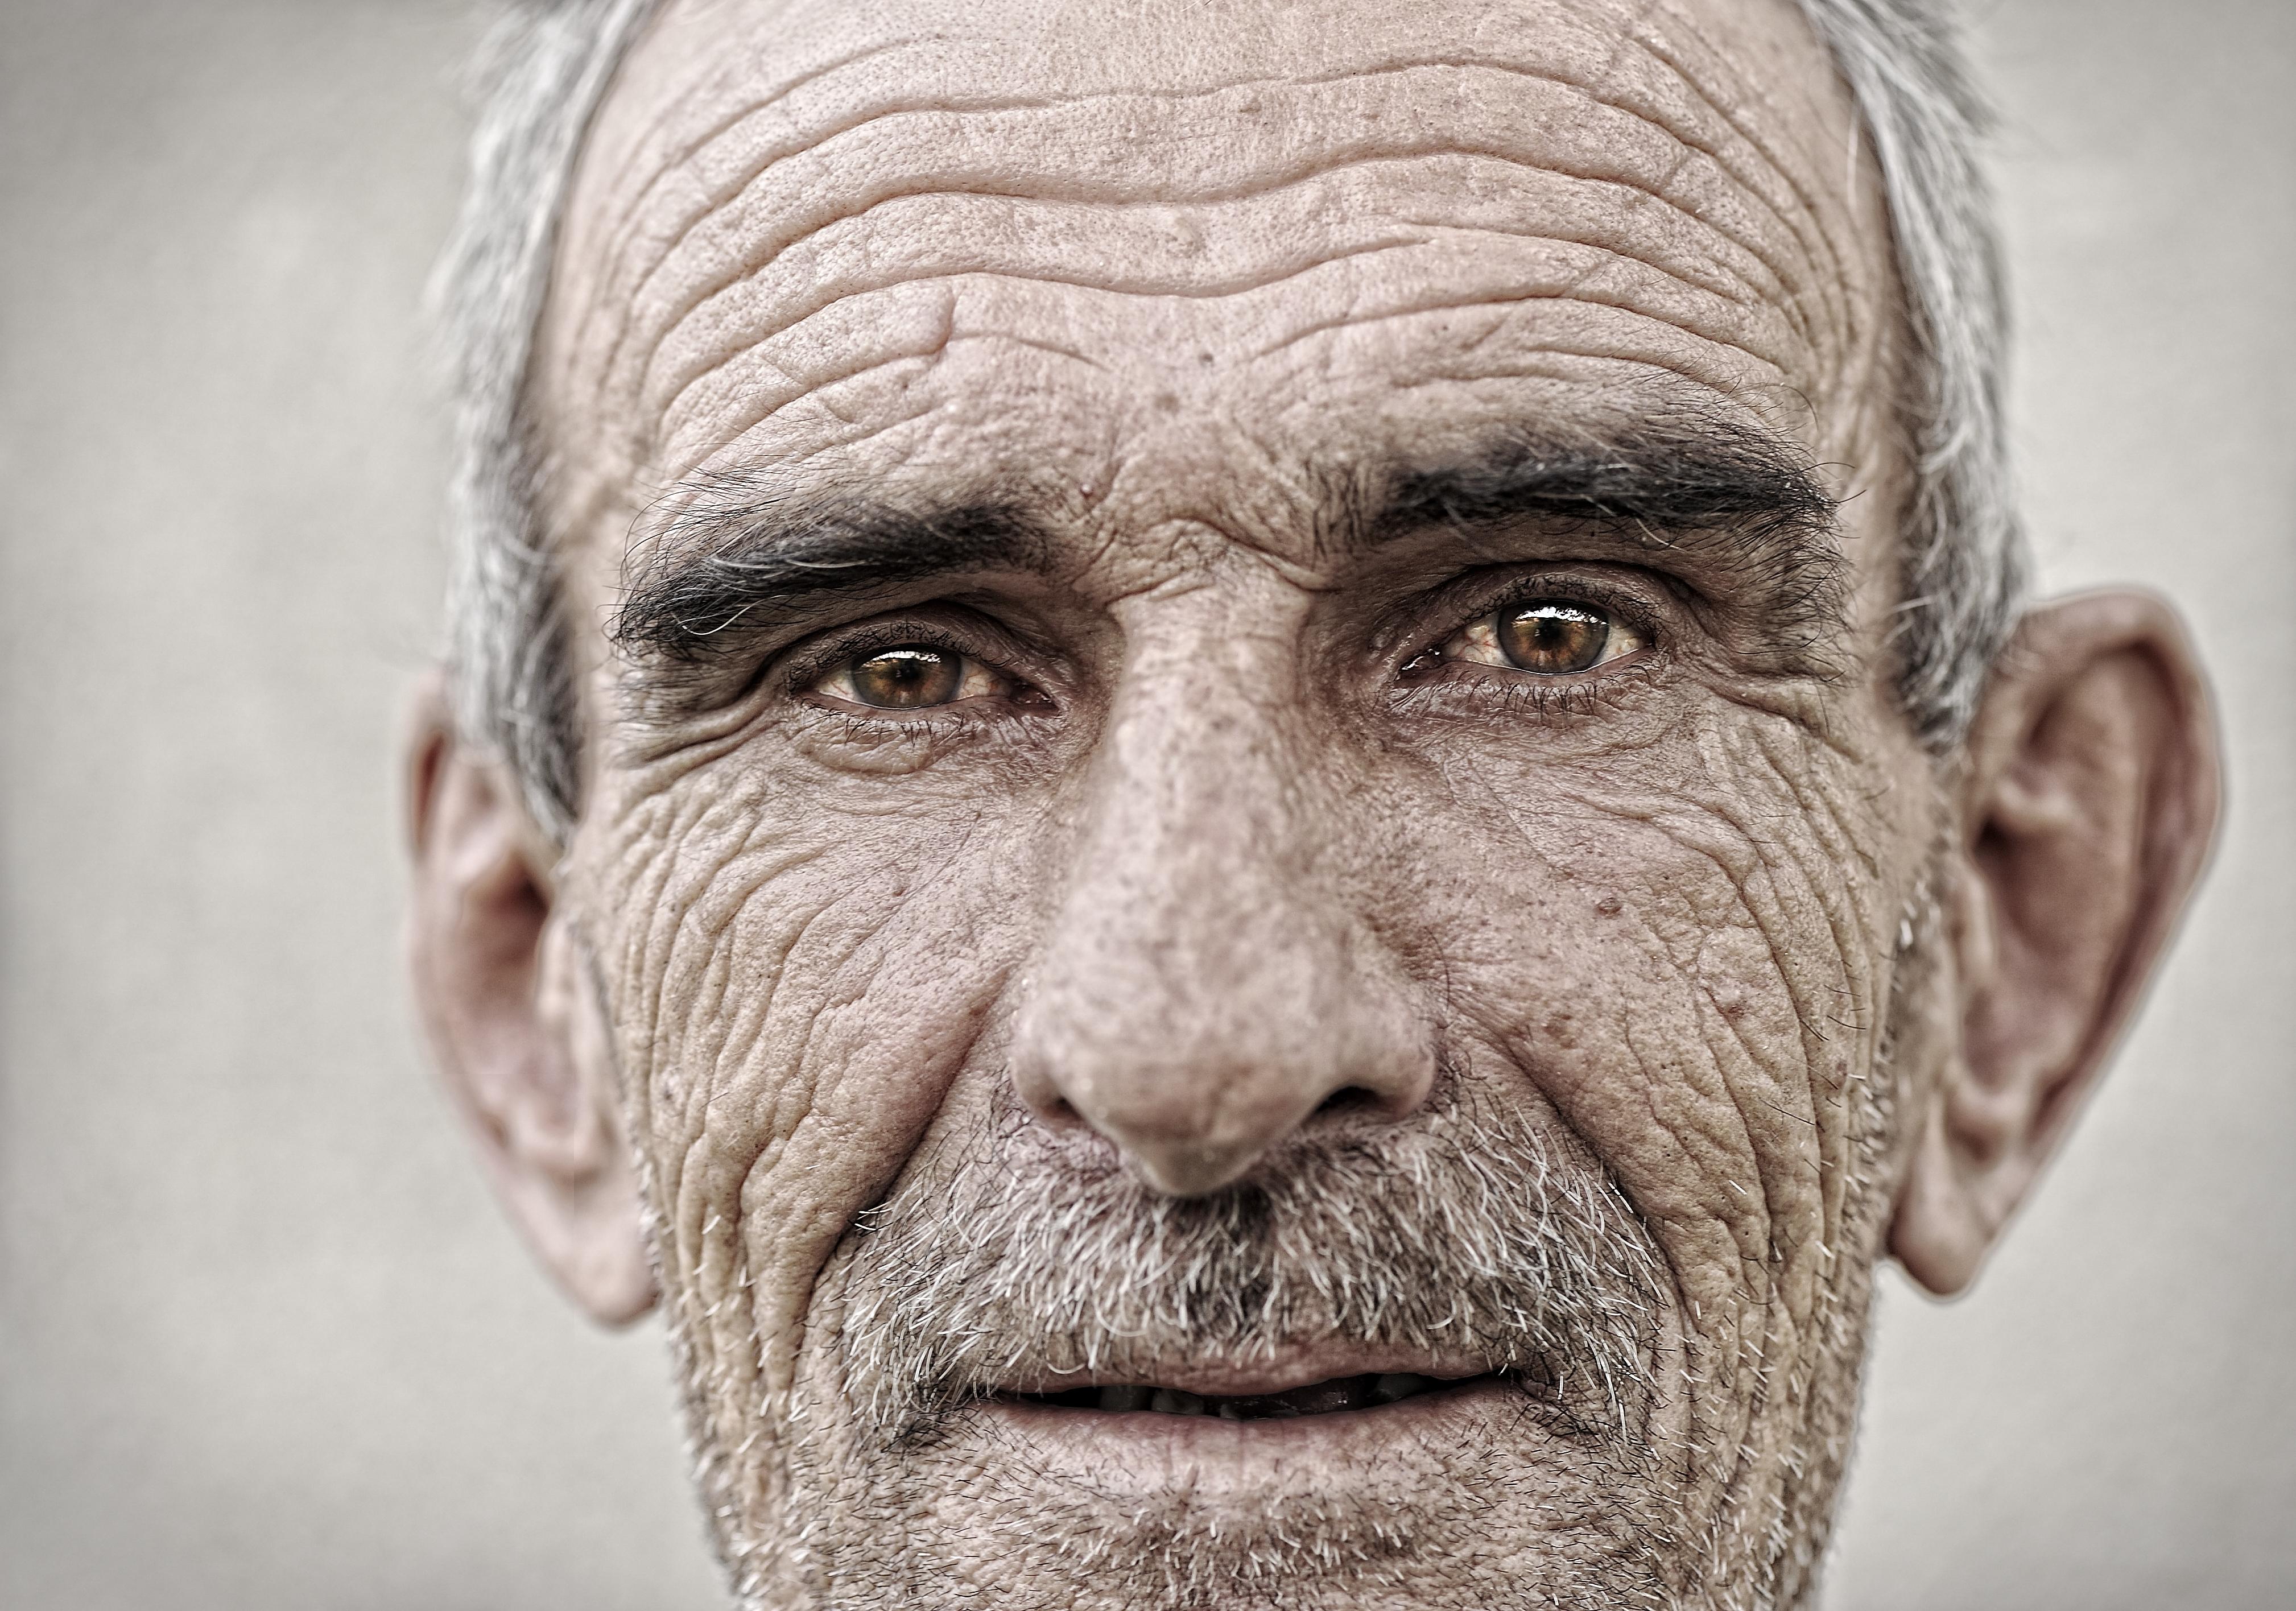 Elderly, old, mature man close up portrait